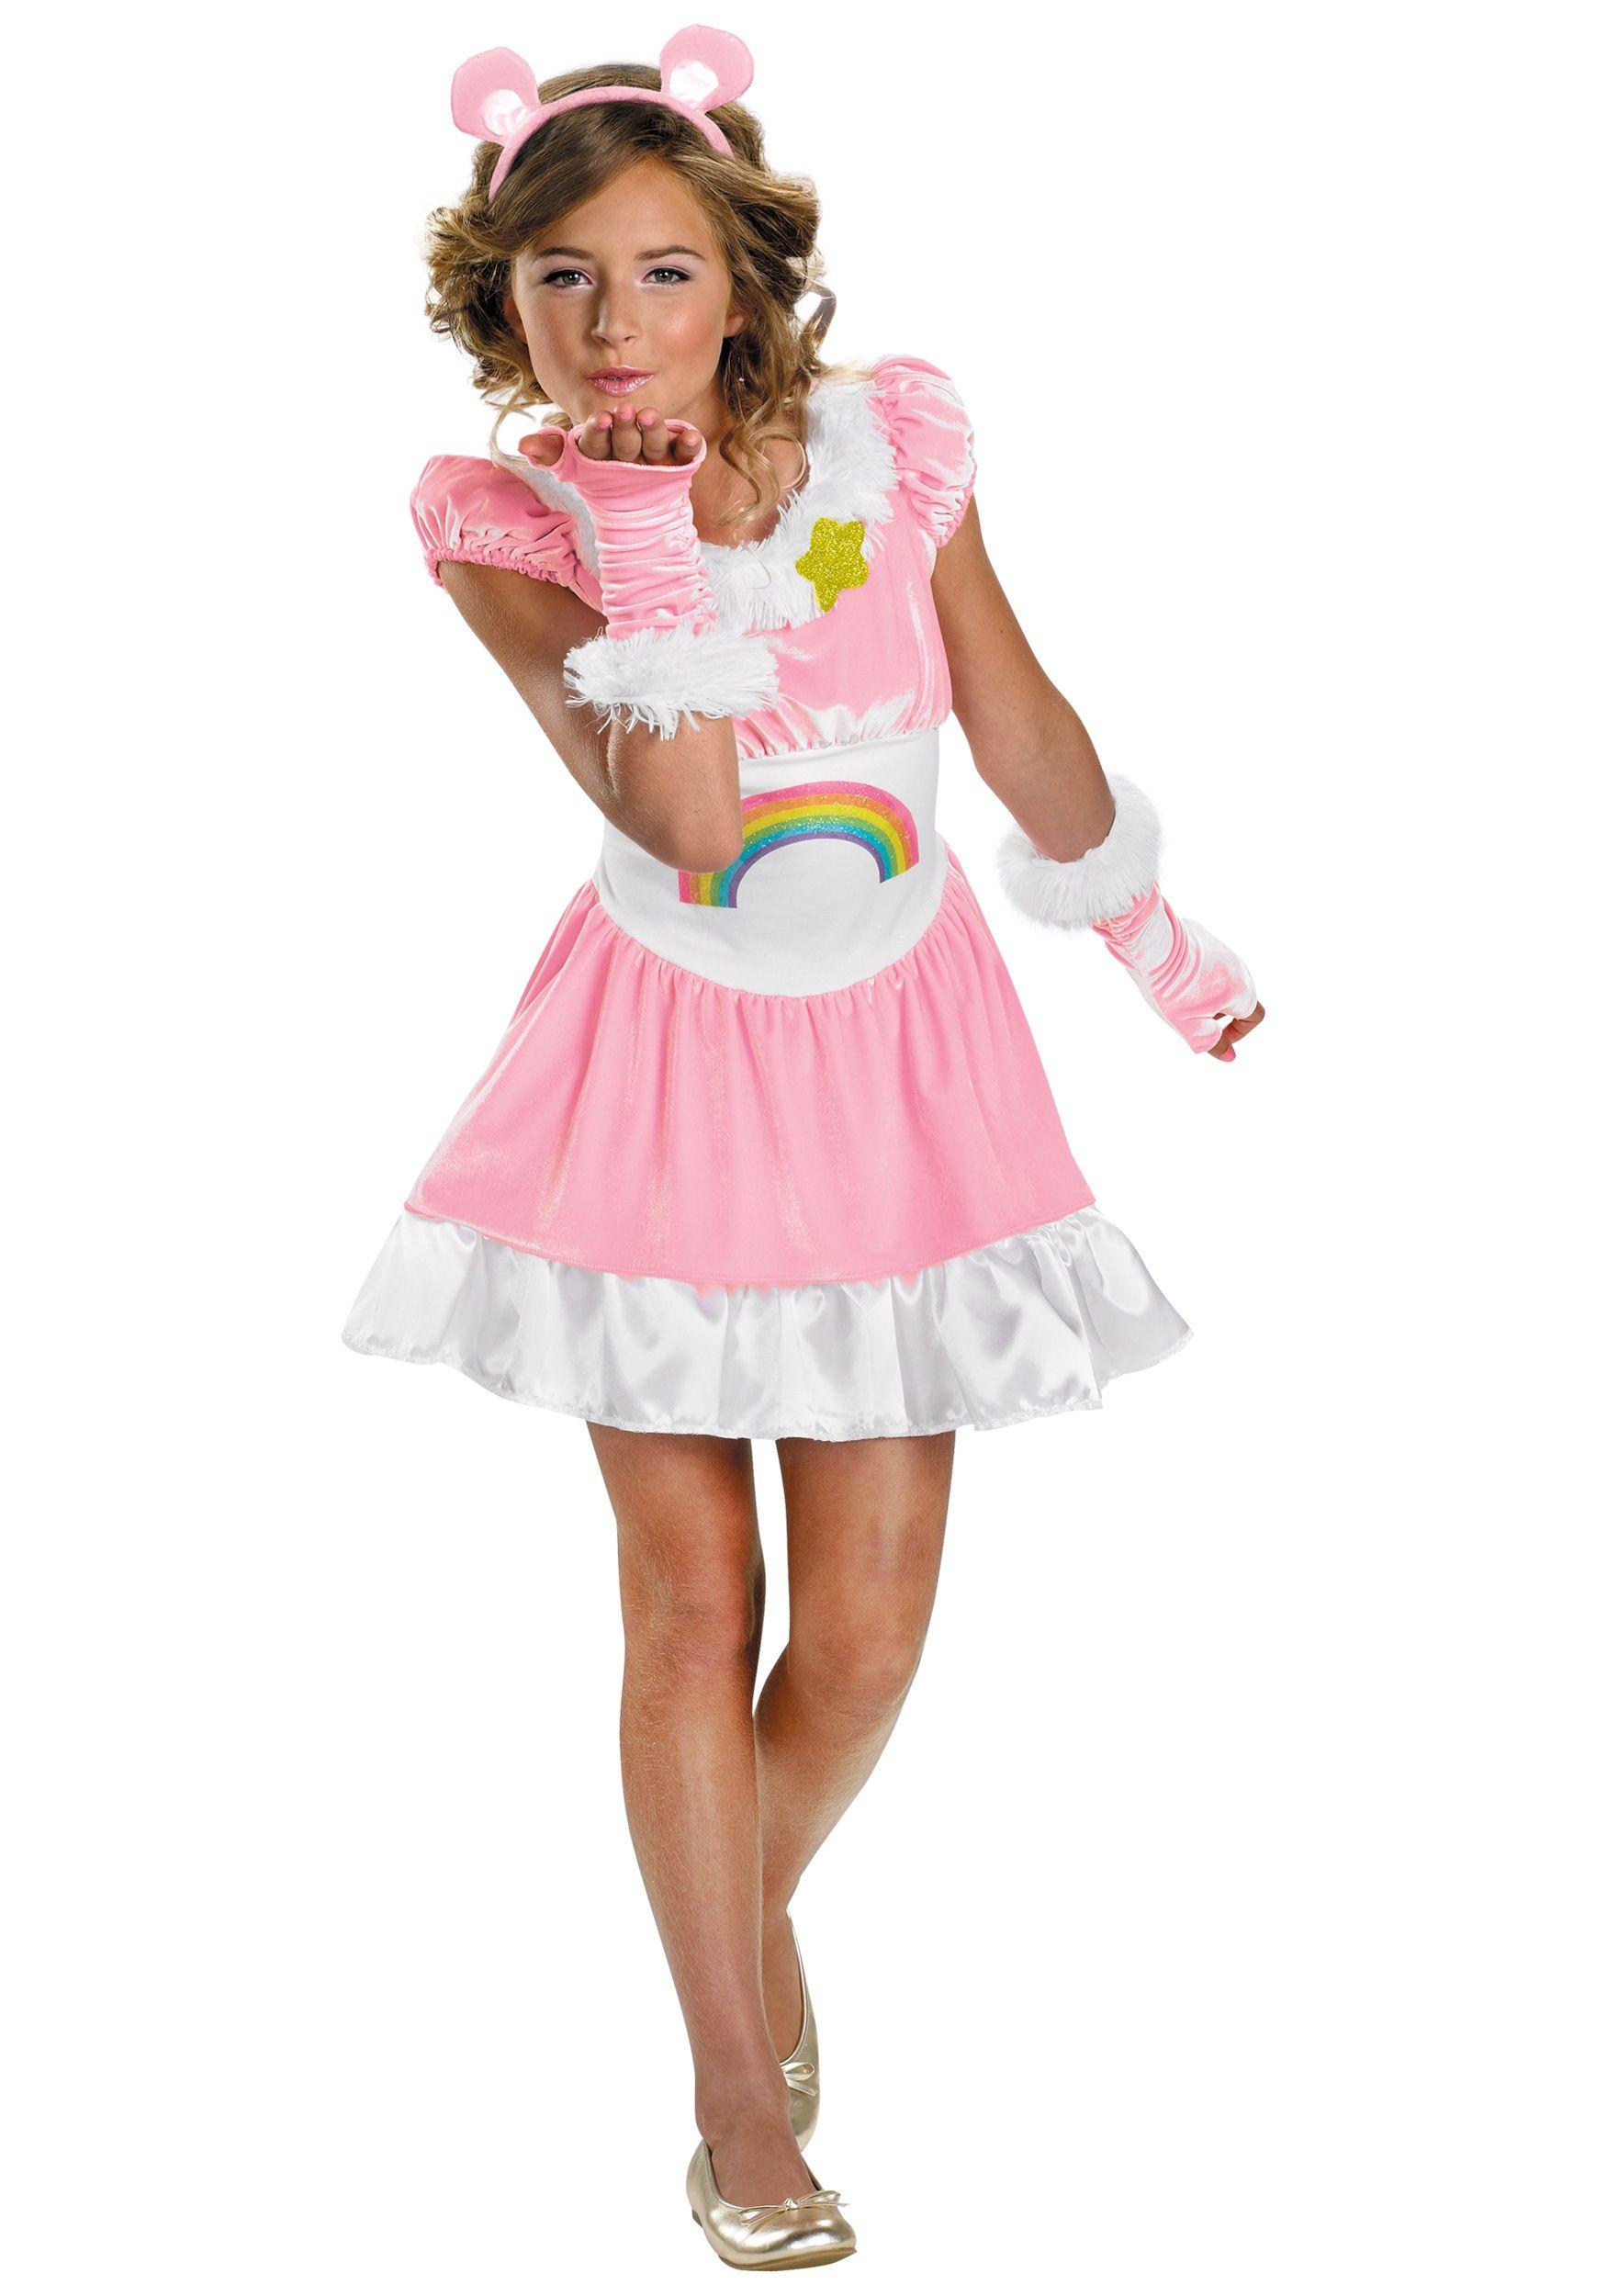 Tween Haloween Costume Halloween Costume Ideas Movie